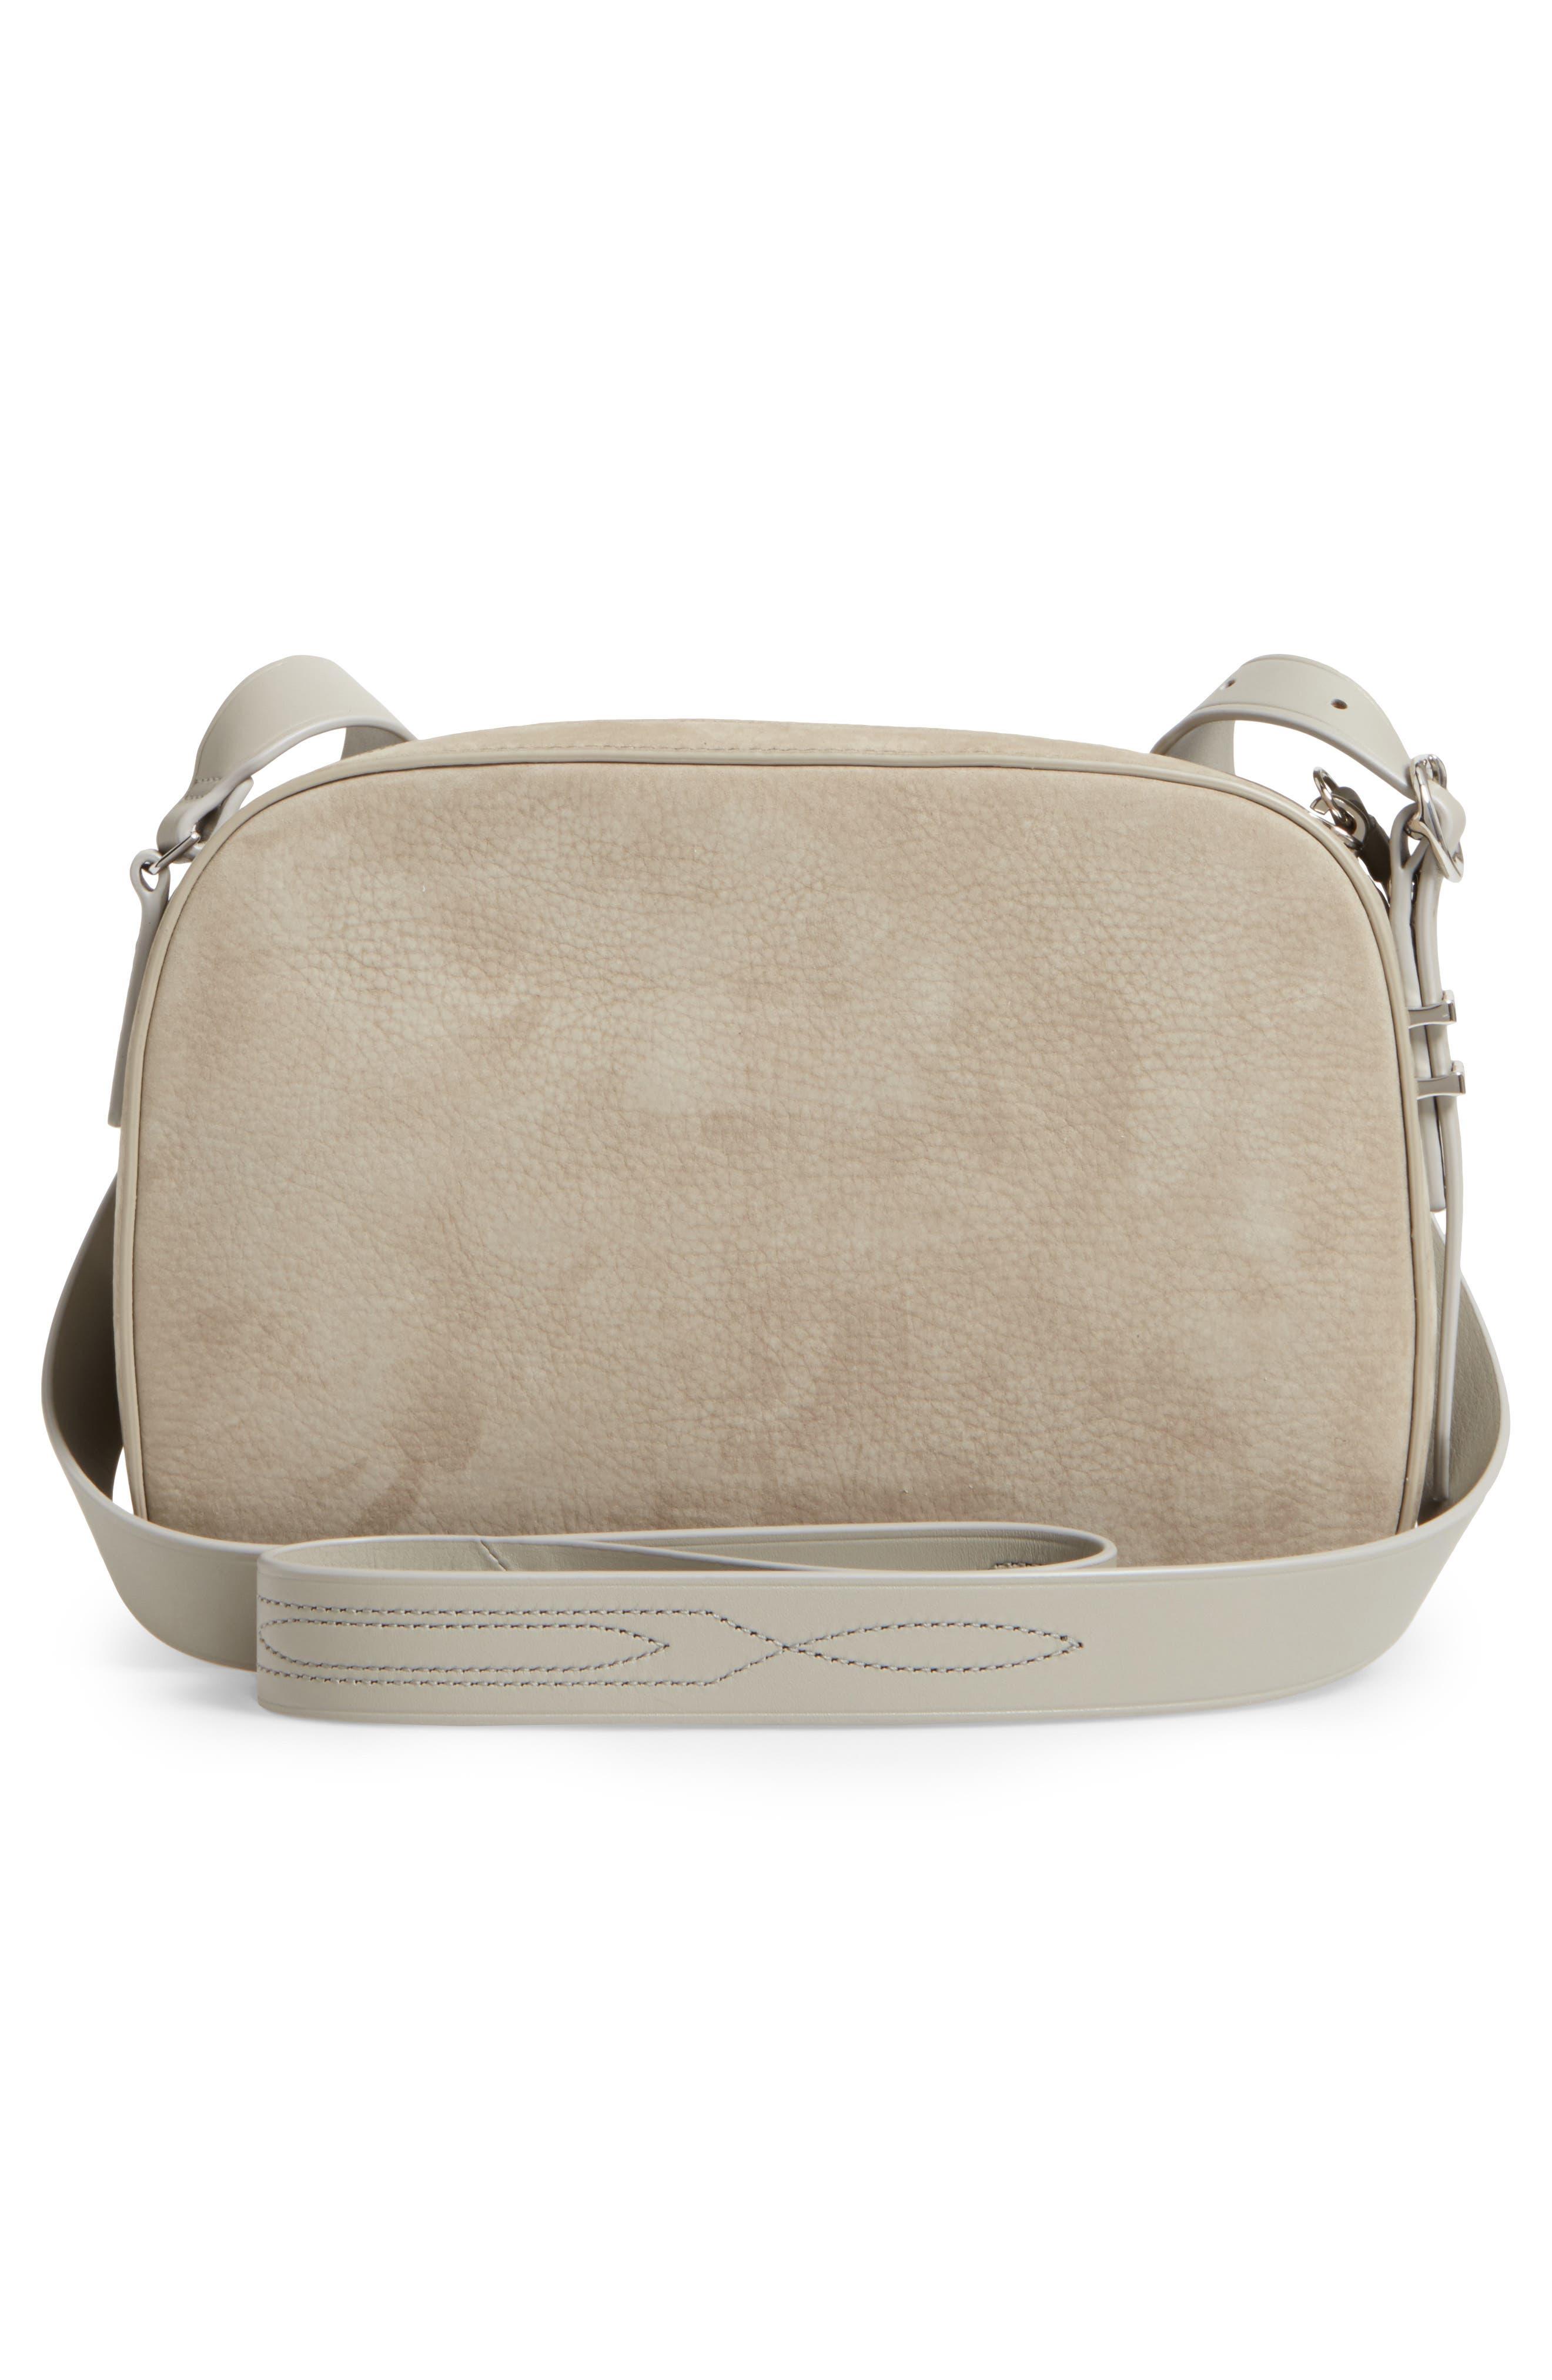 Cooper Nubuck Leather Shoulder Bag,                             Alternate thumbnail 3, color,                             Light Cement Grey